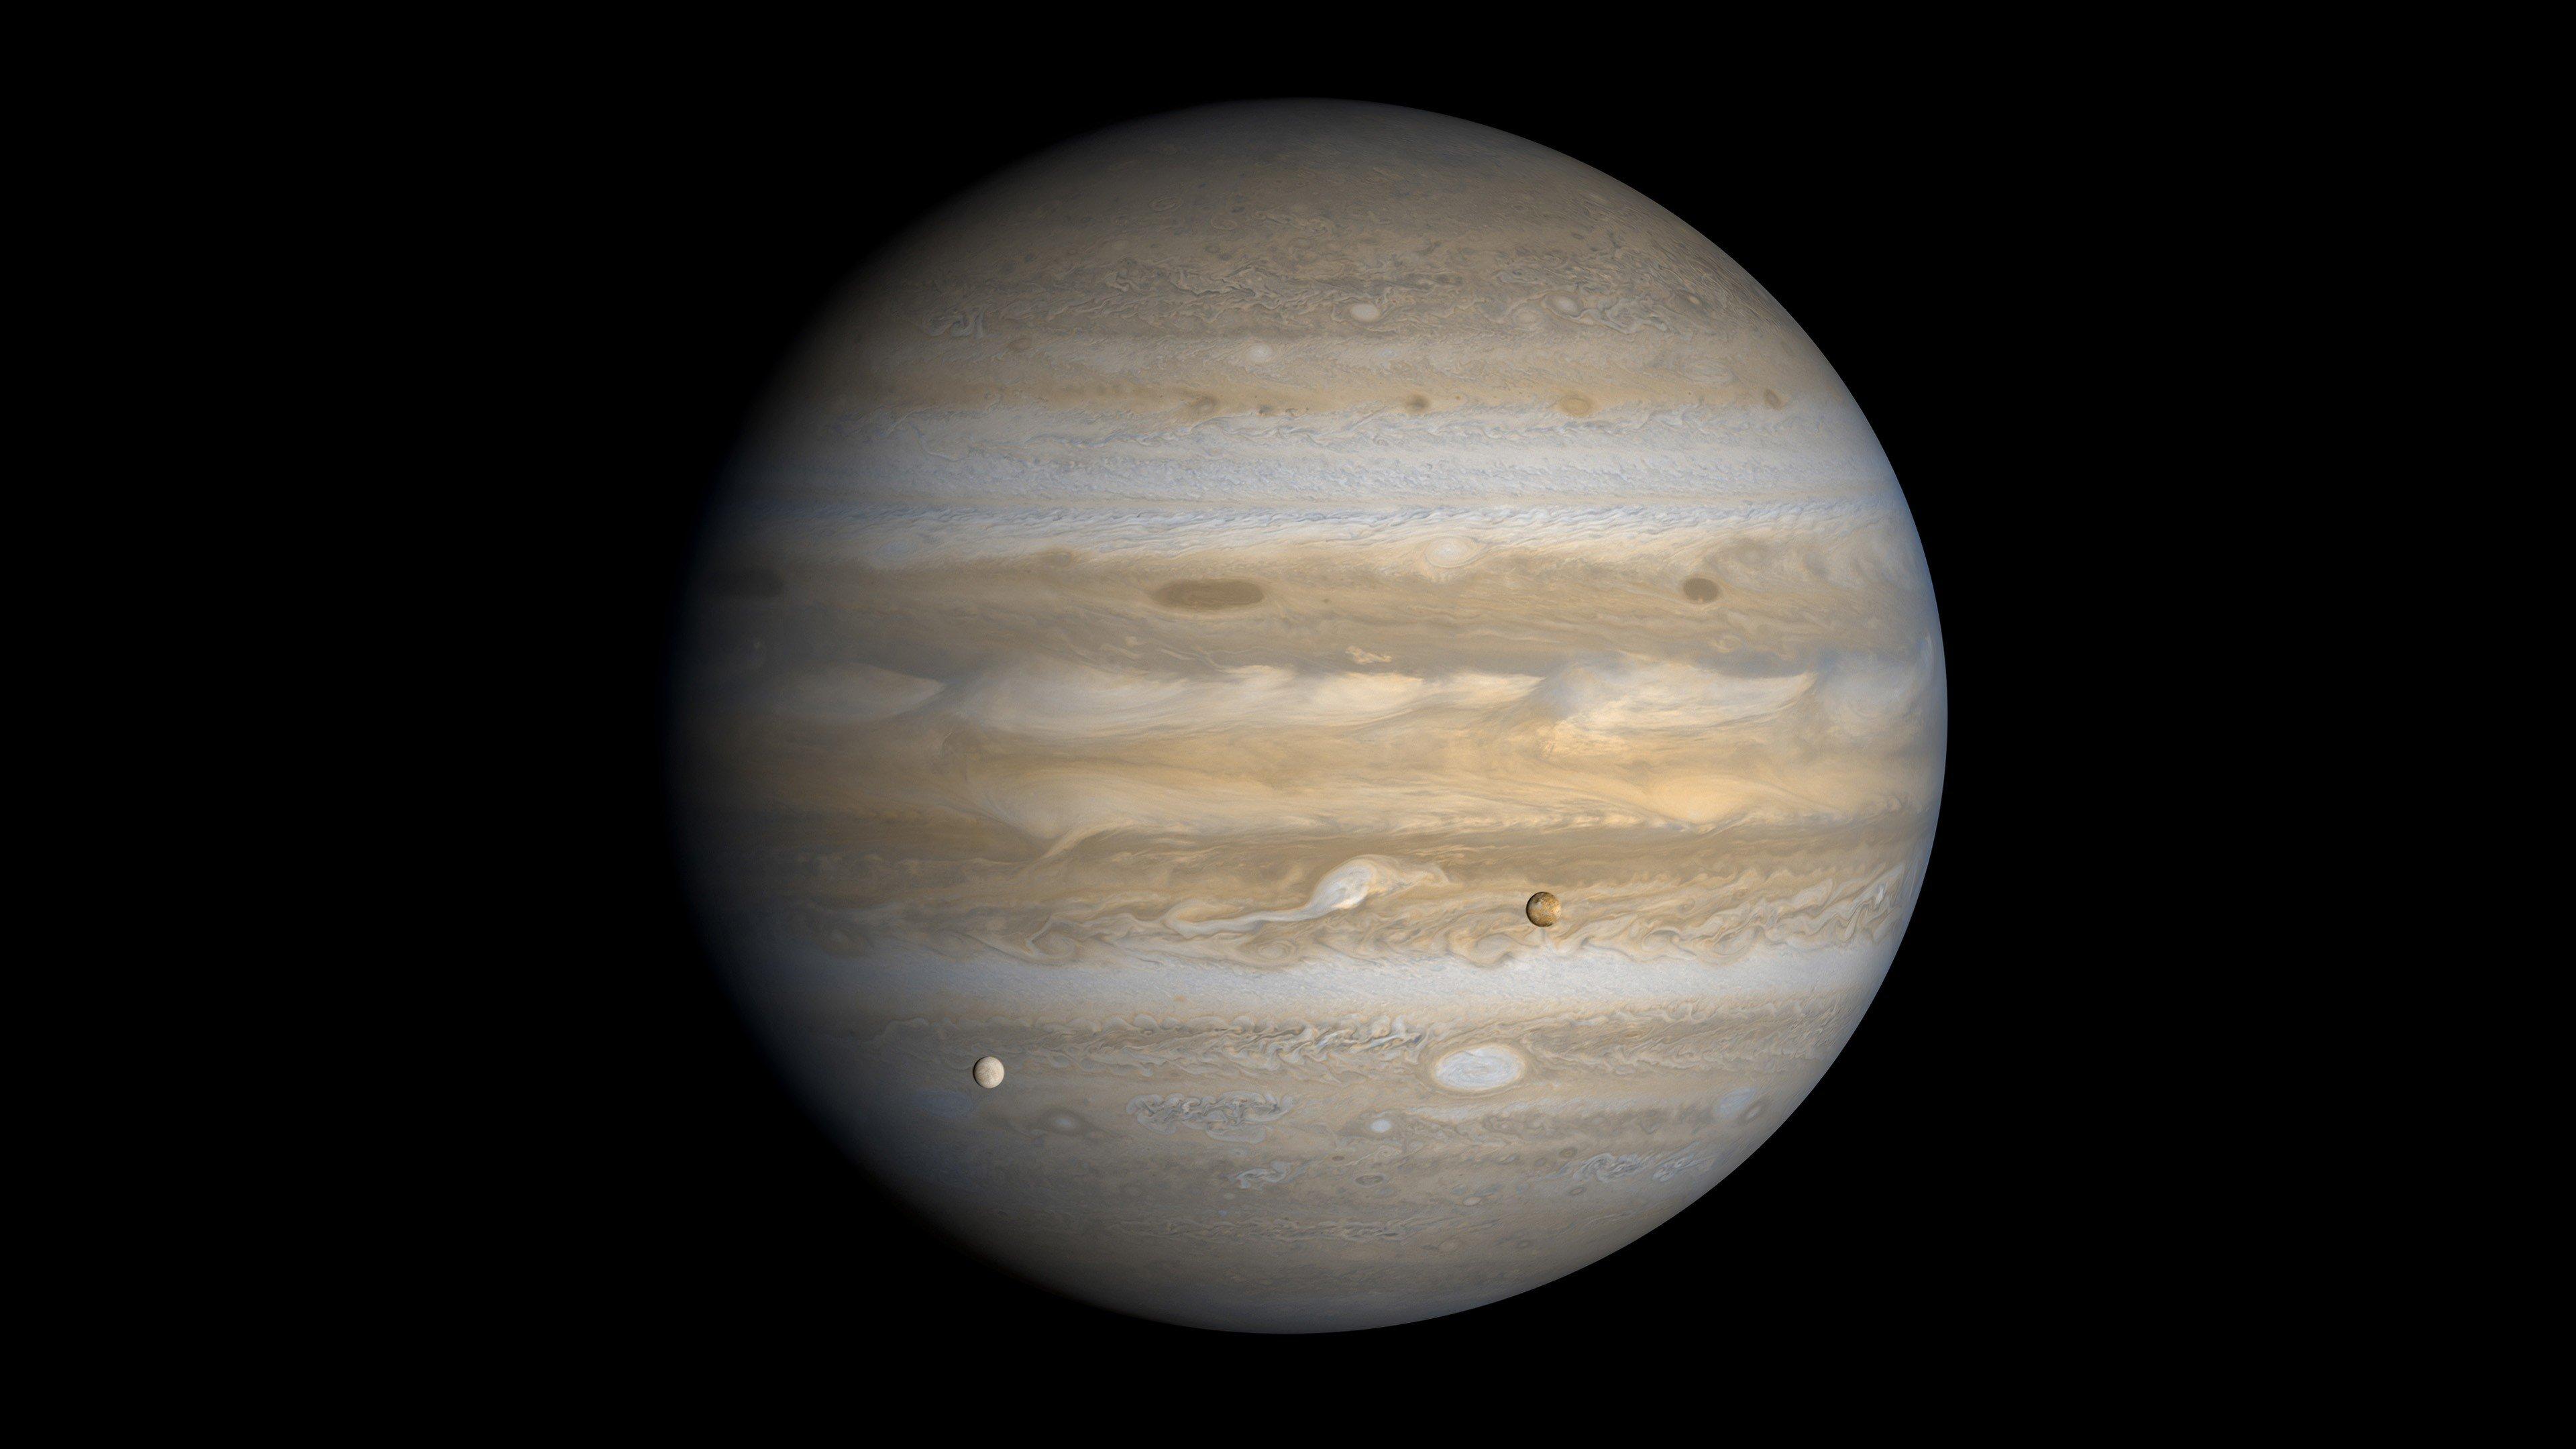 Jupiter space minimalism hd wallpapers desktop and - Jupiter wallpaper ...